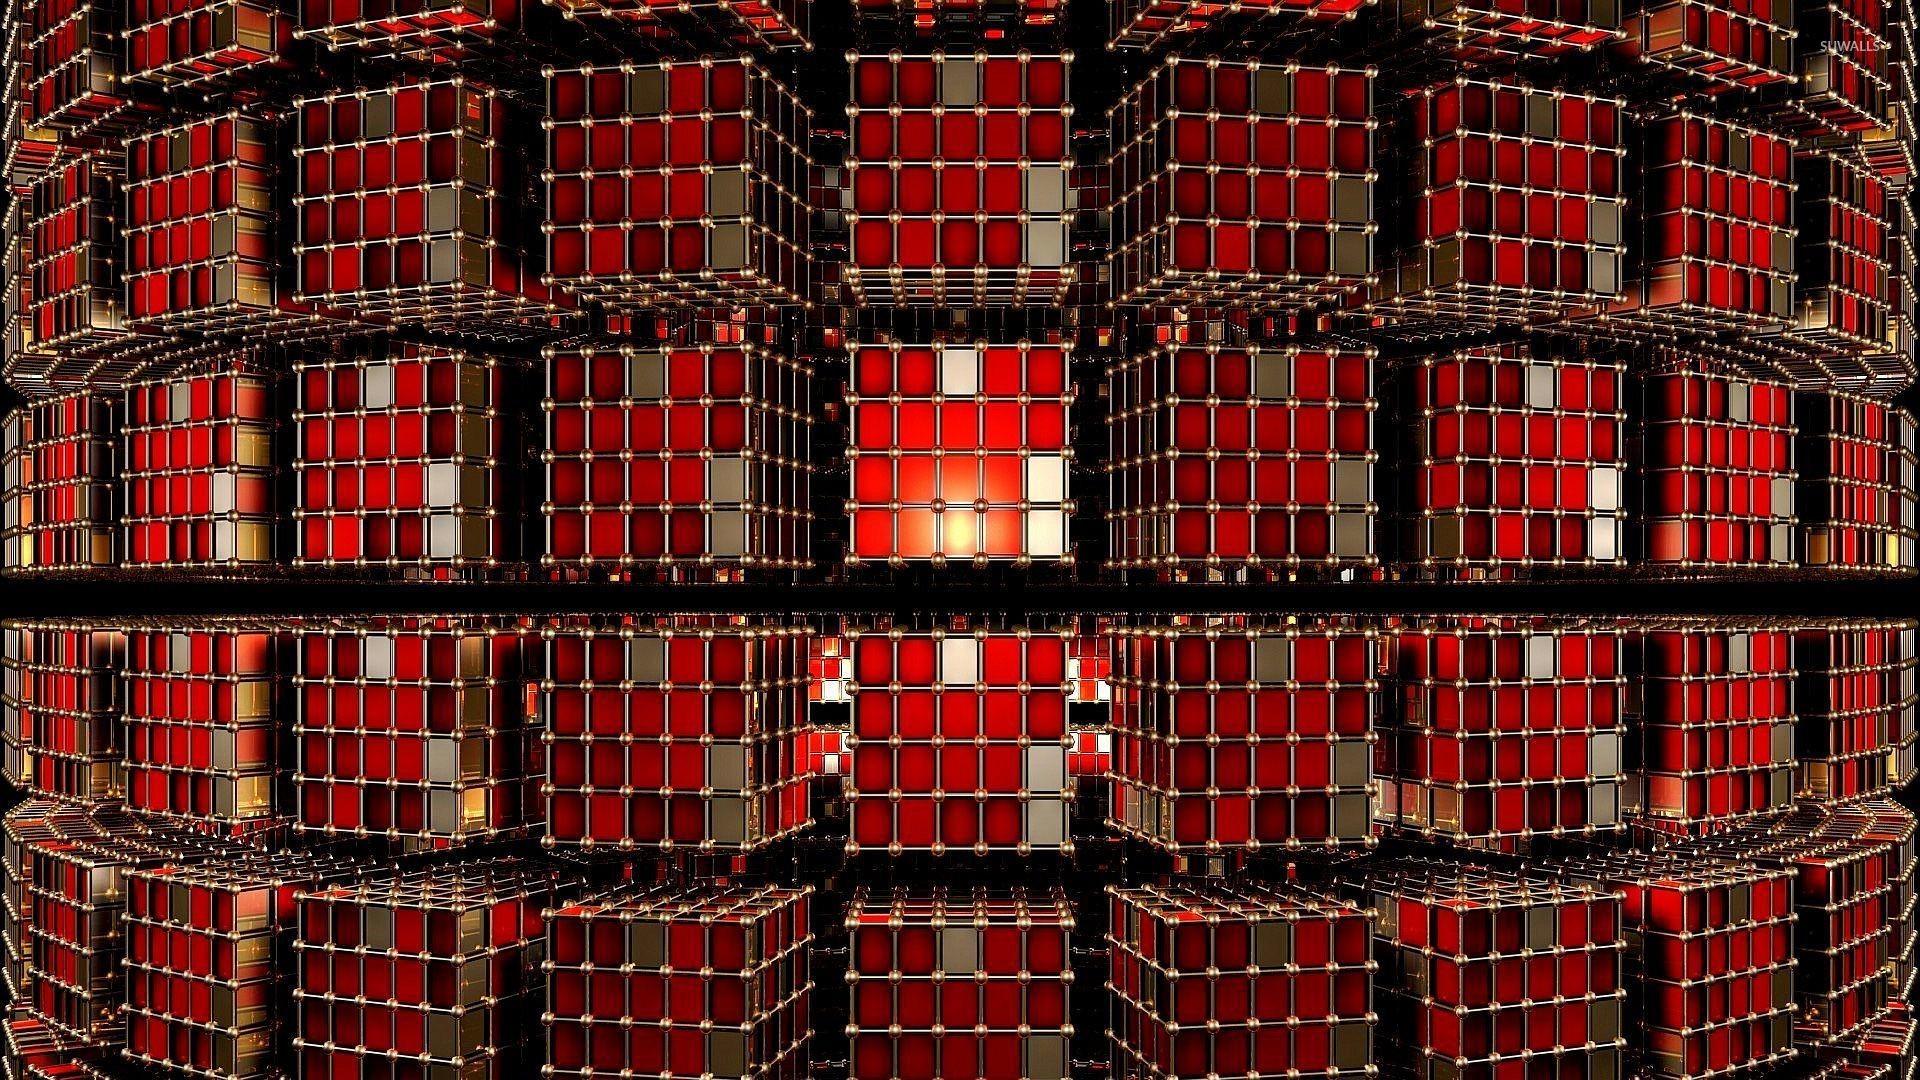 Red metallic cubes wallpaper